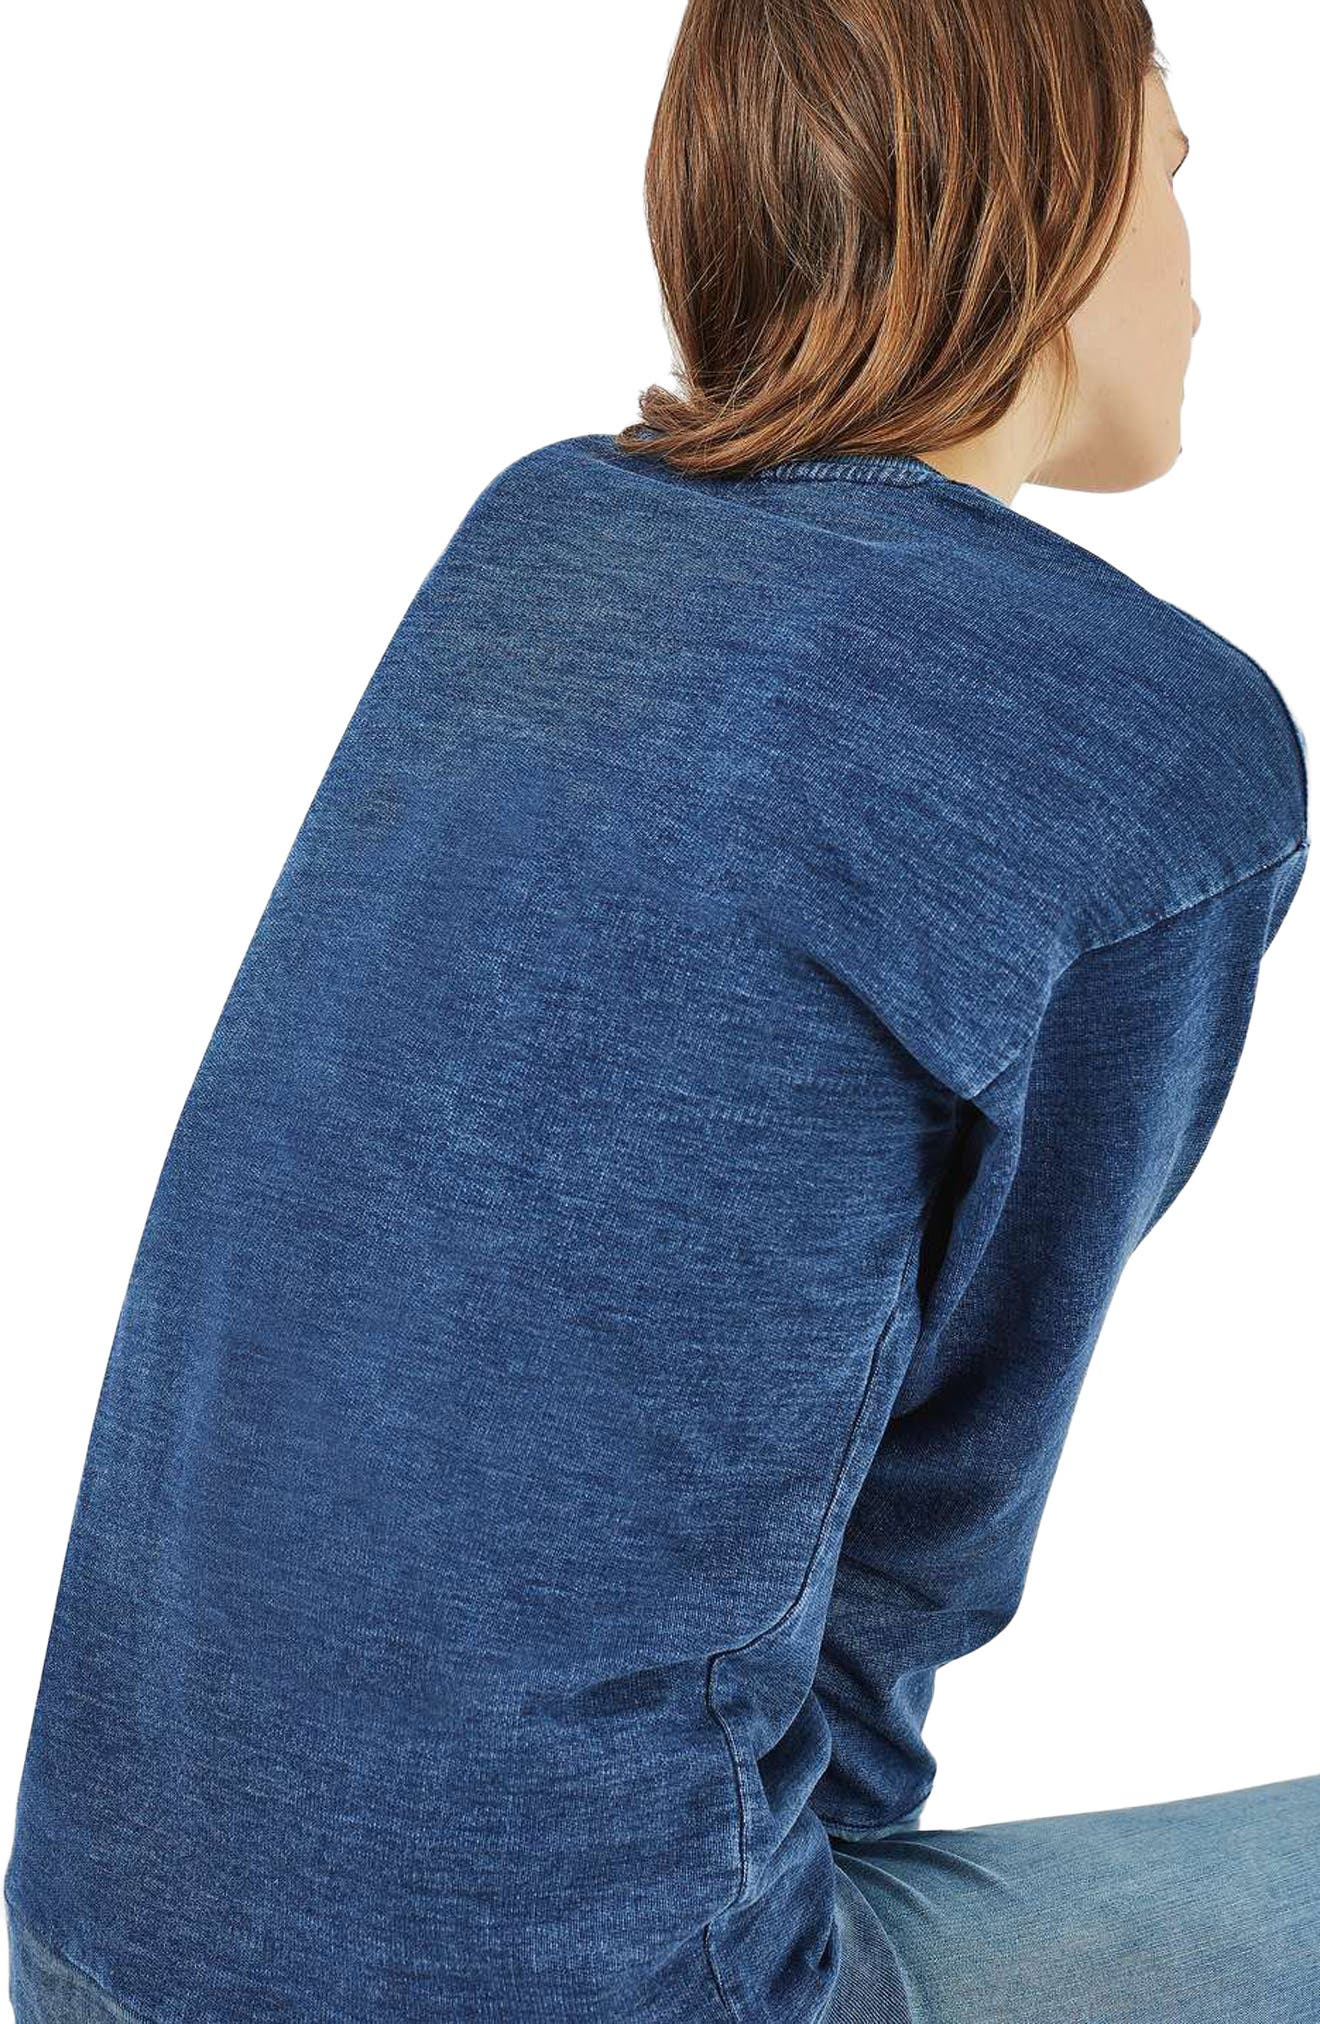 Alternate Image 2  - Topshop Denim Patchwork Sweatshirt